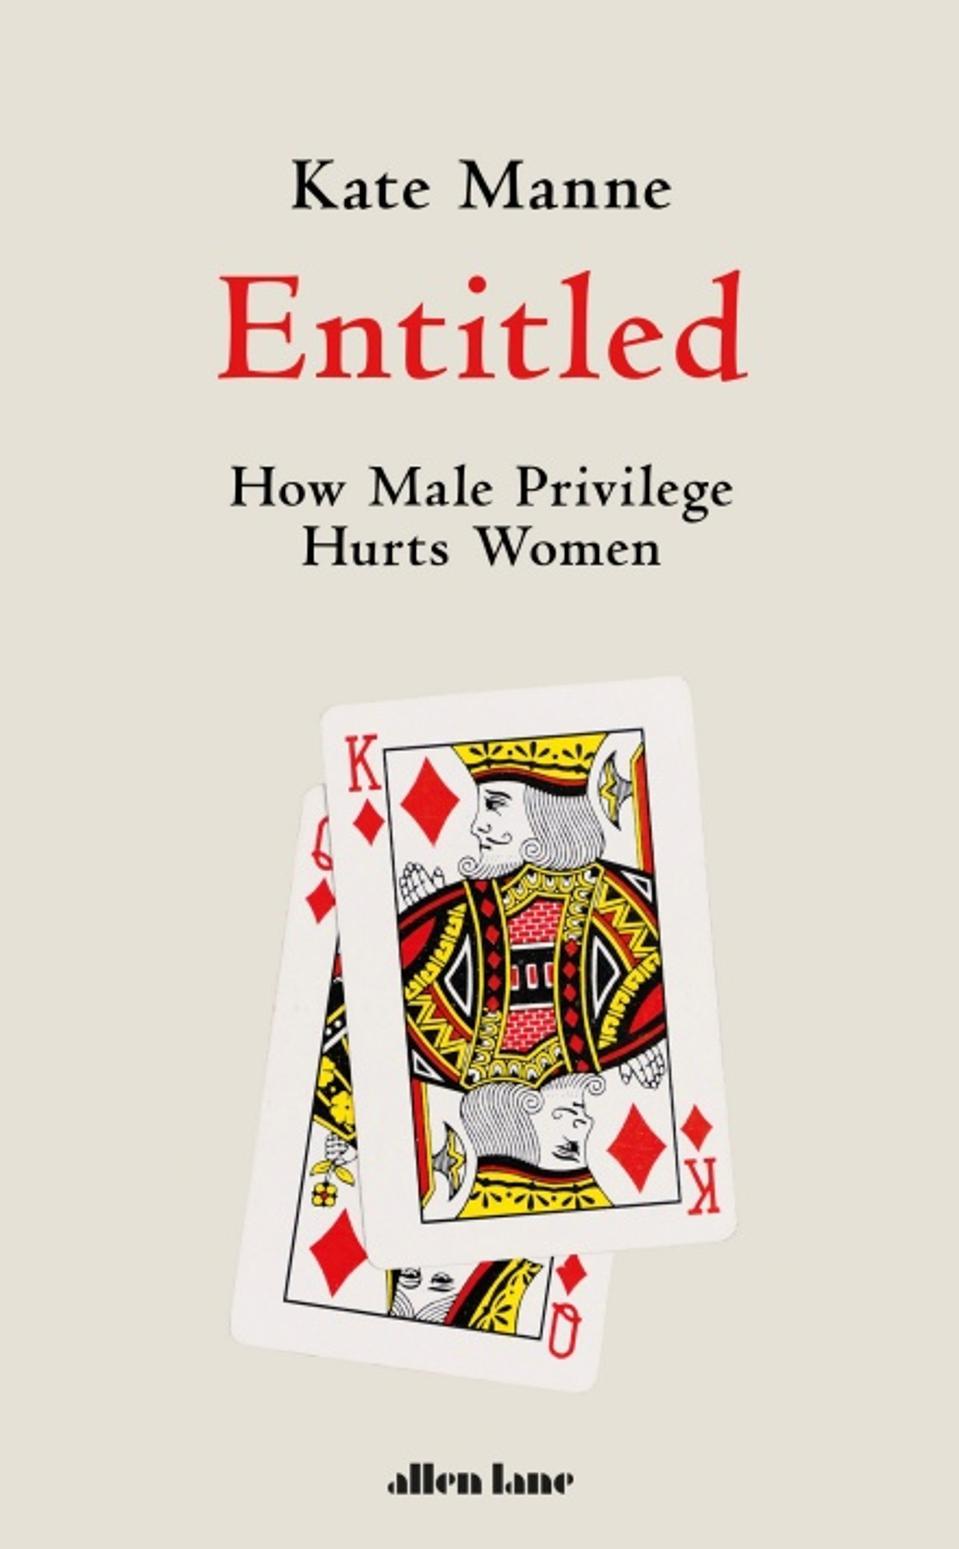 Entitled by Kate Manne Book jacket by Allen Lane